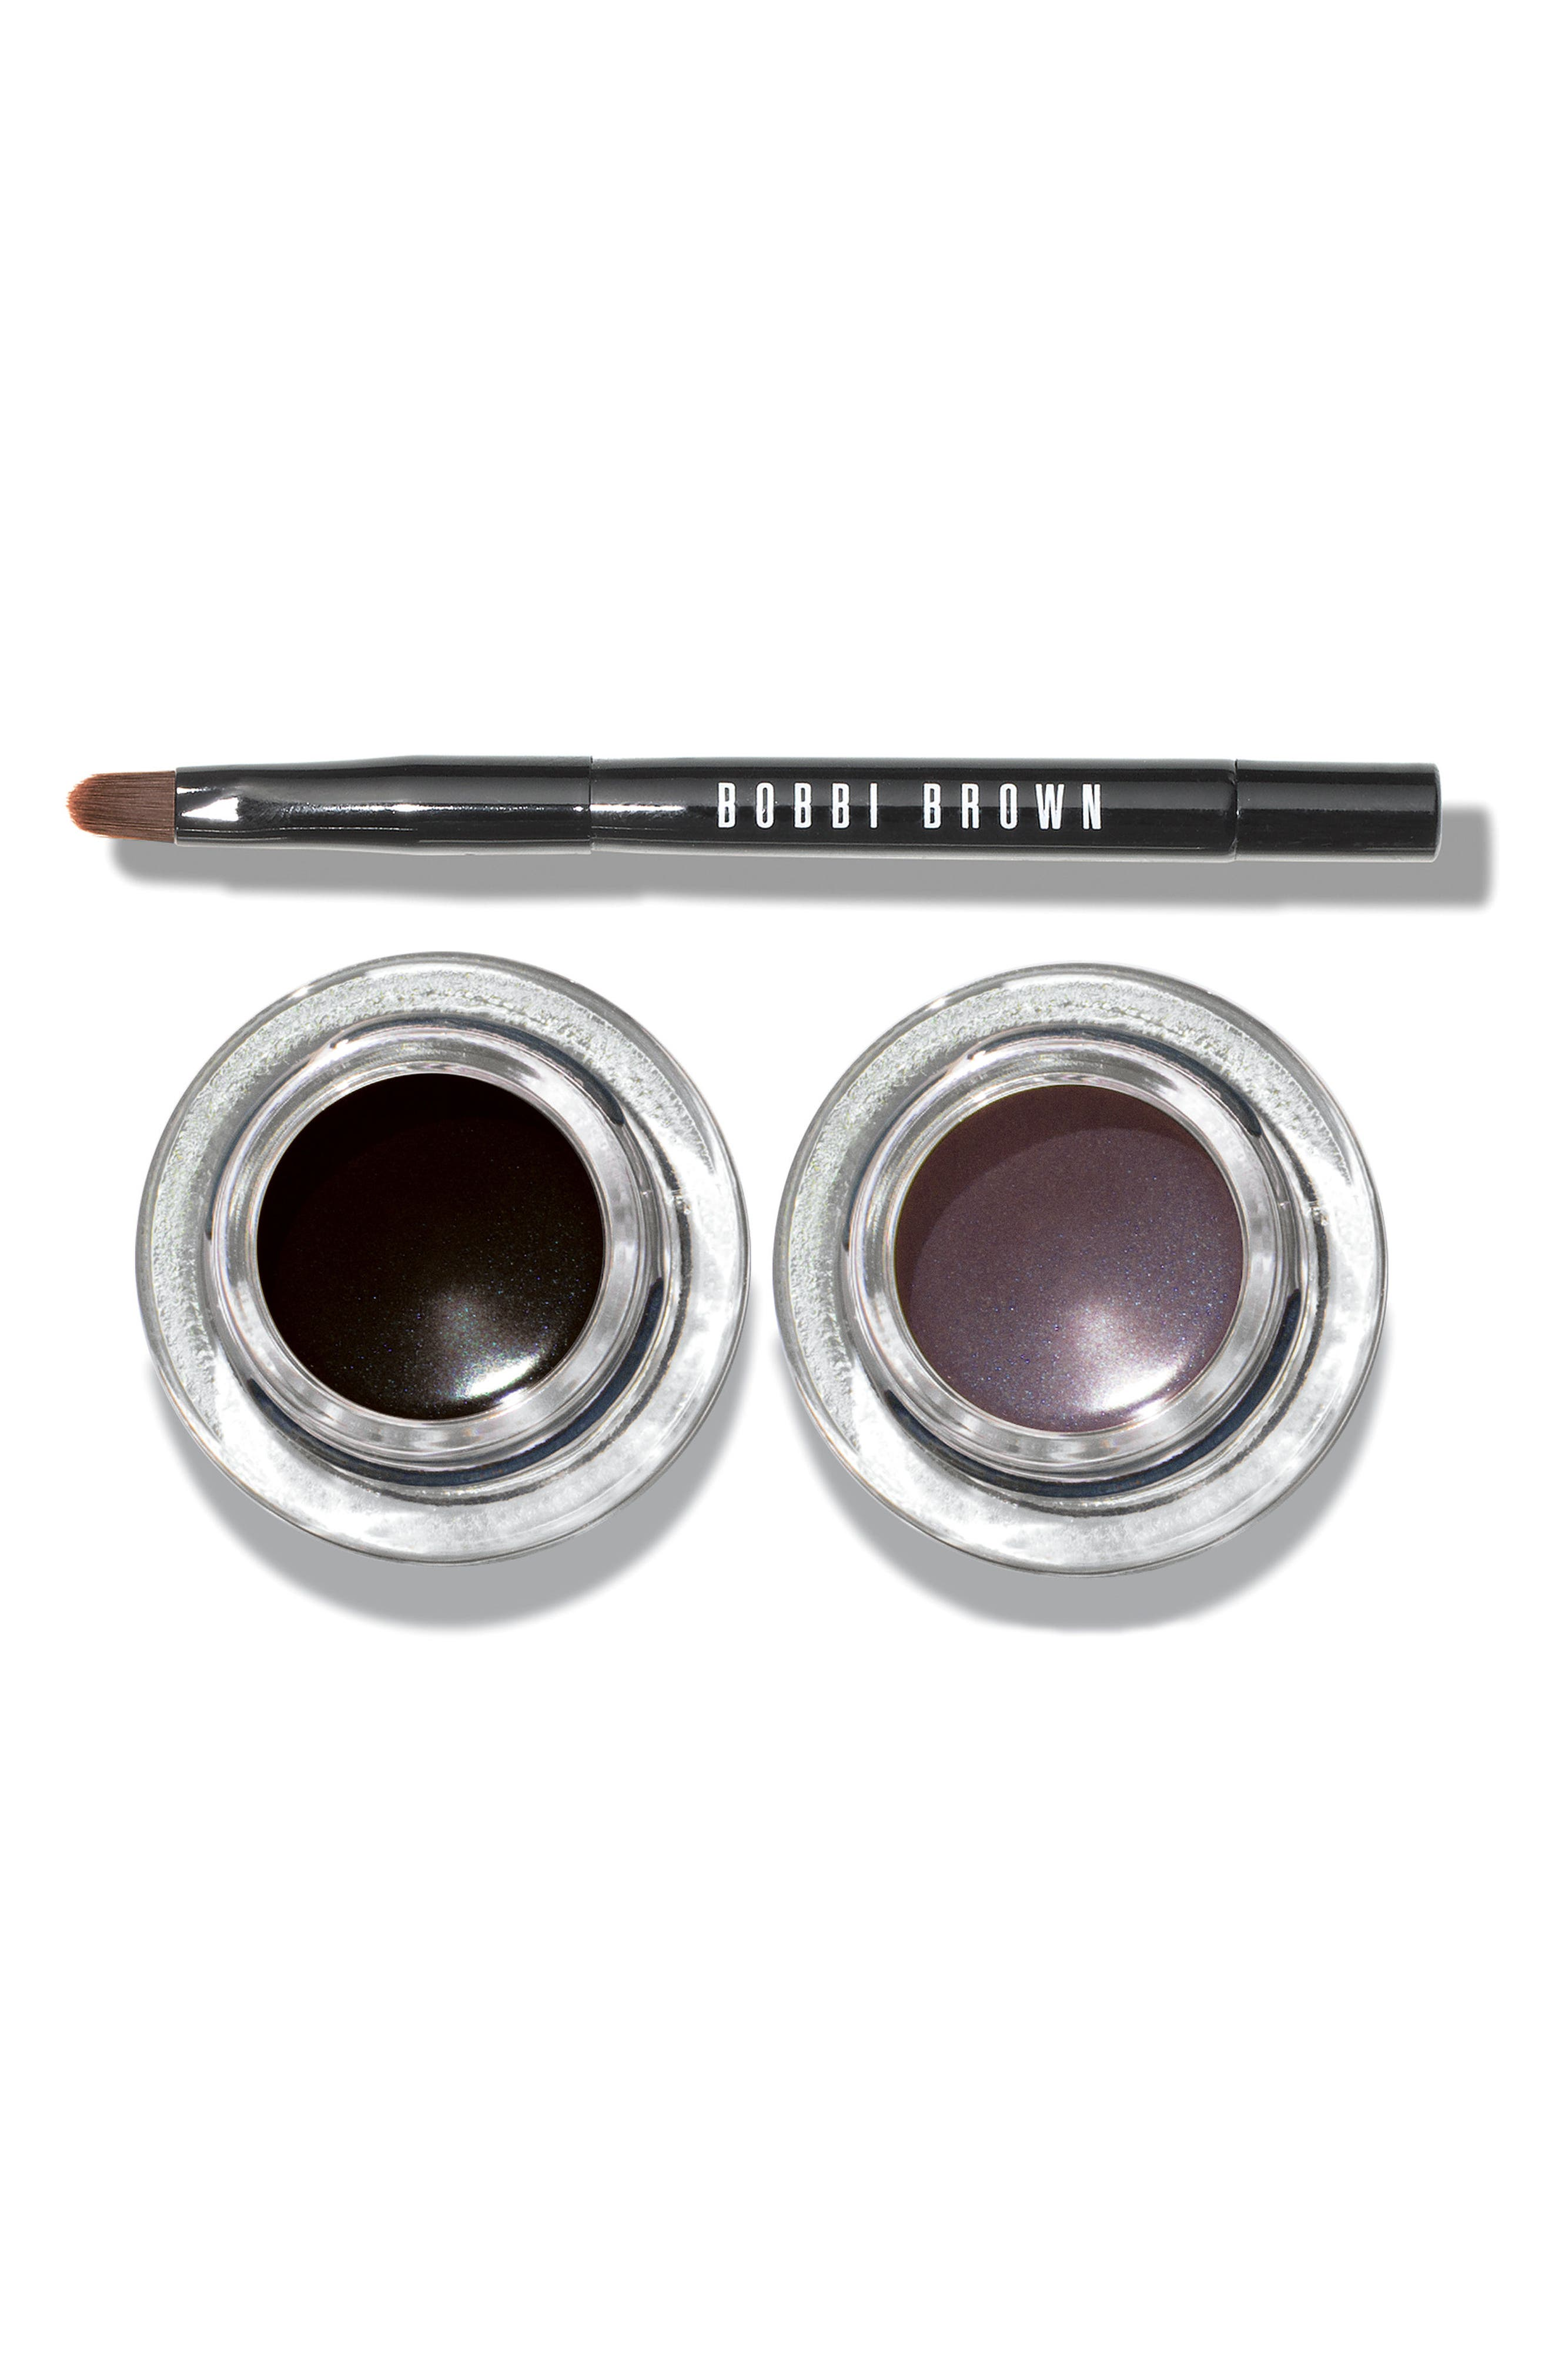 Main Image - Bobbi Brown Cat-Eye Long-Wear Gel Eyeliner & Brush Set ($42 Value)